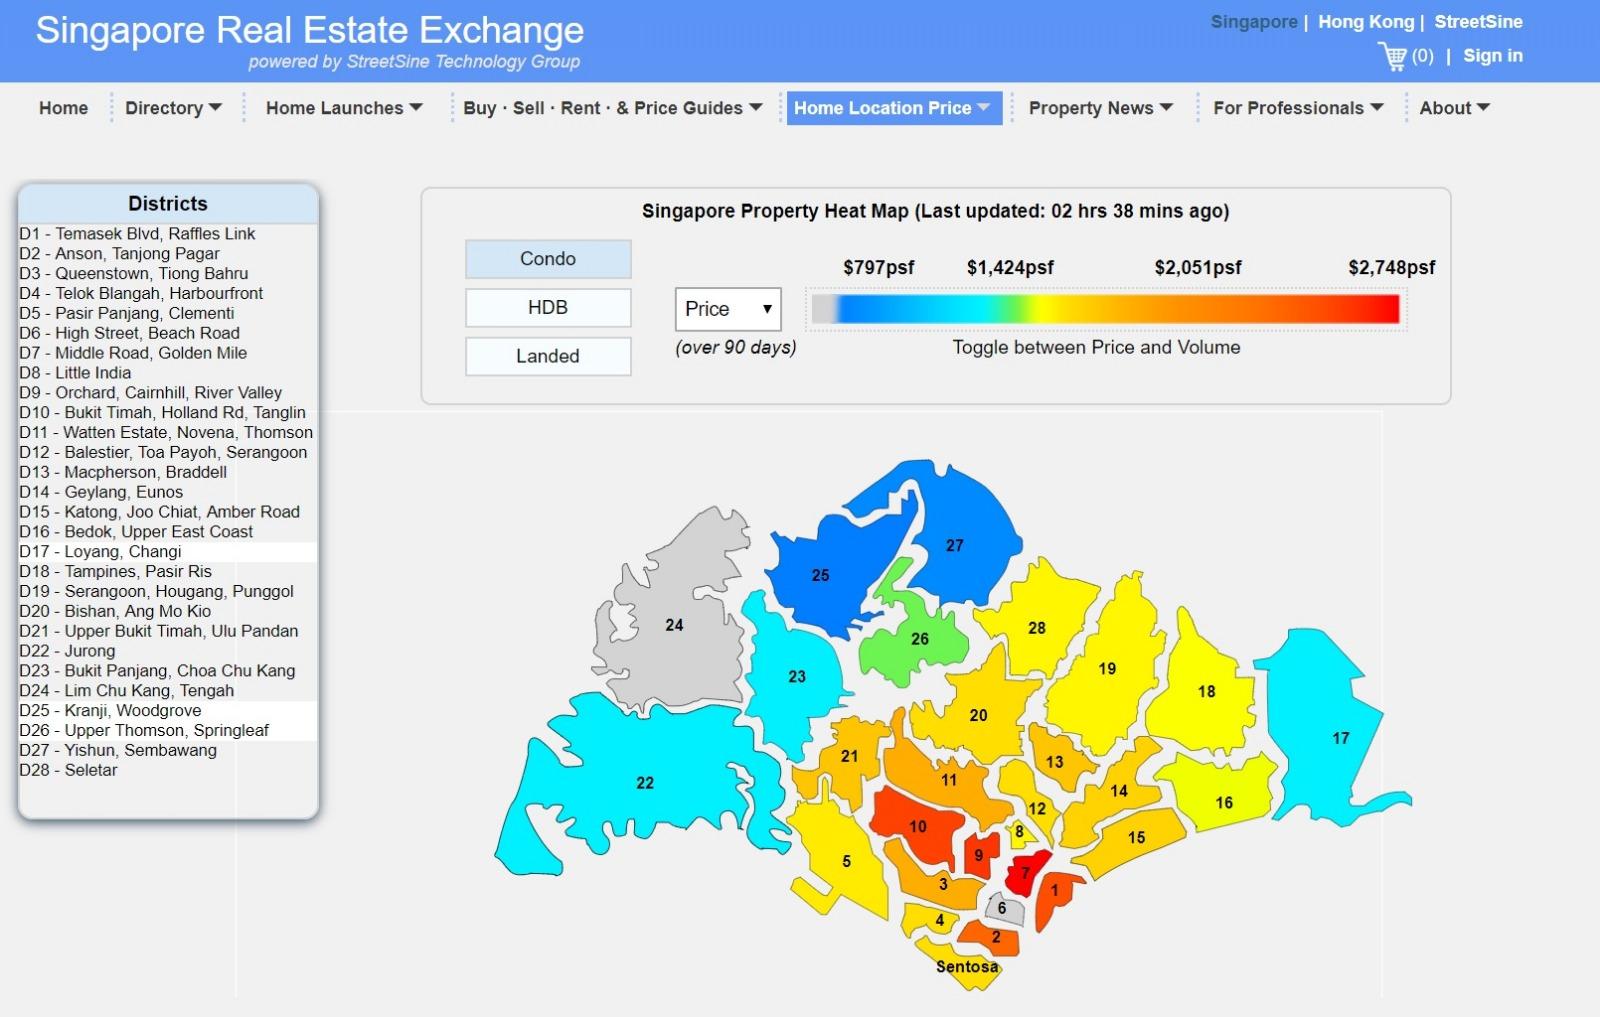 Singapore property hot map 新加坡房产热门地区的分布图